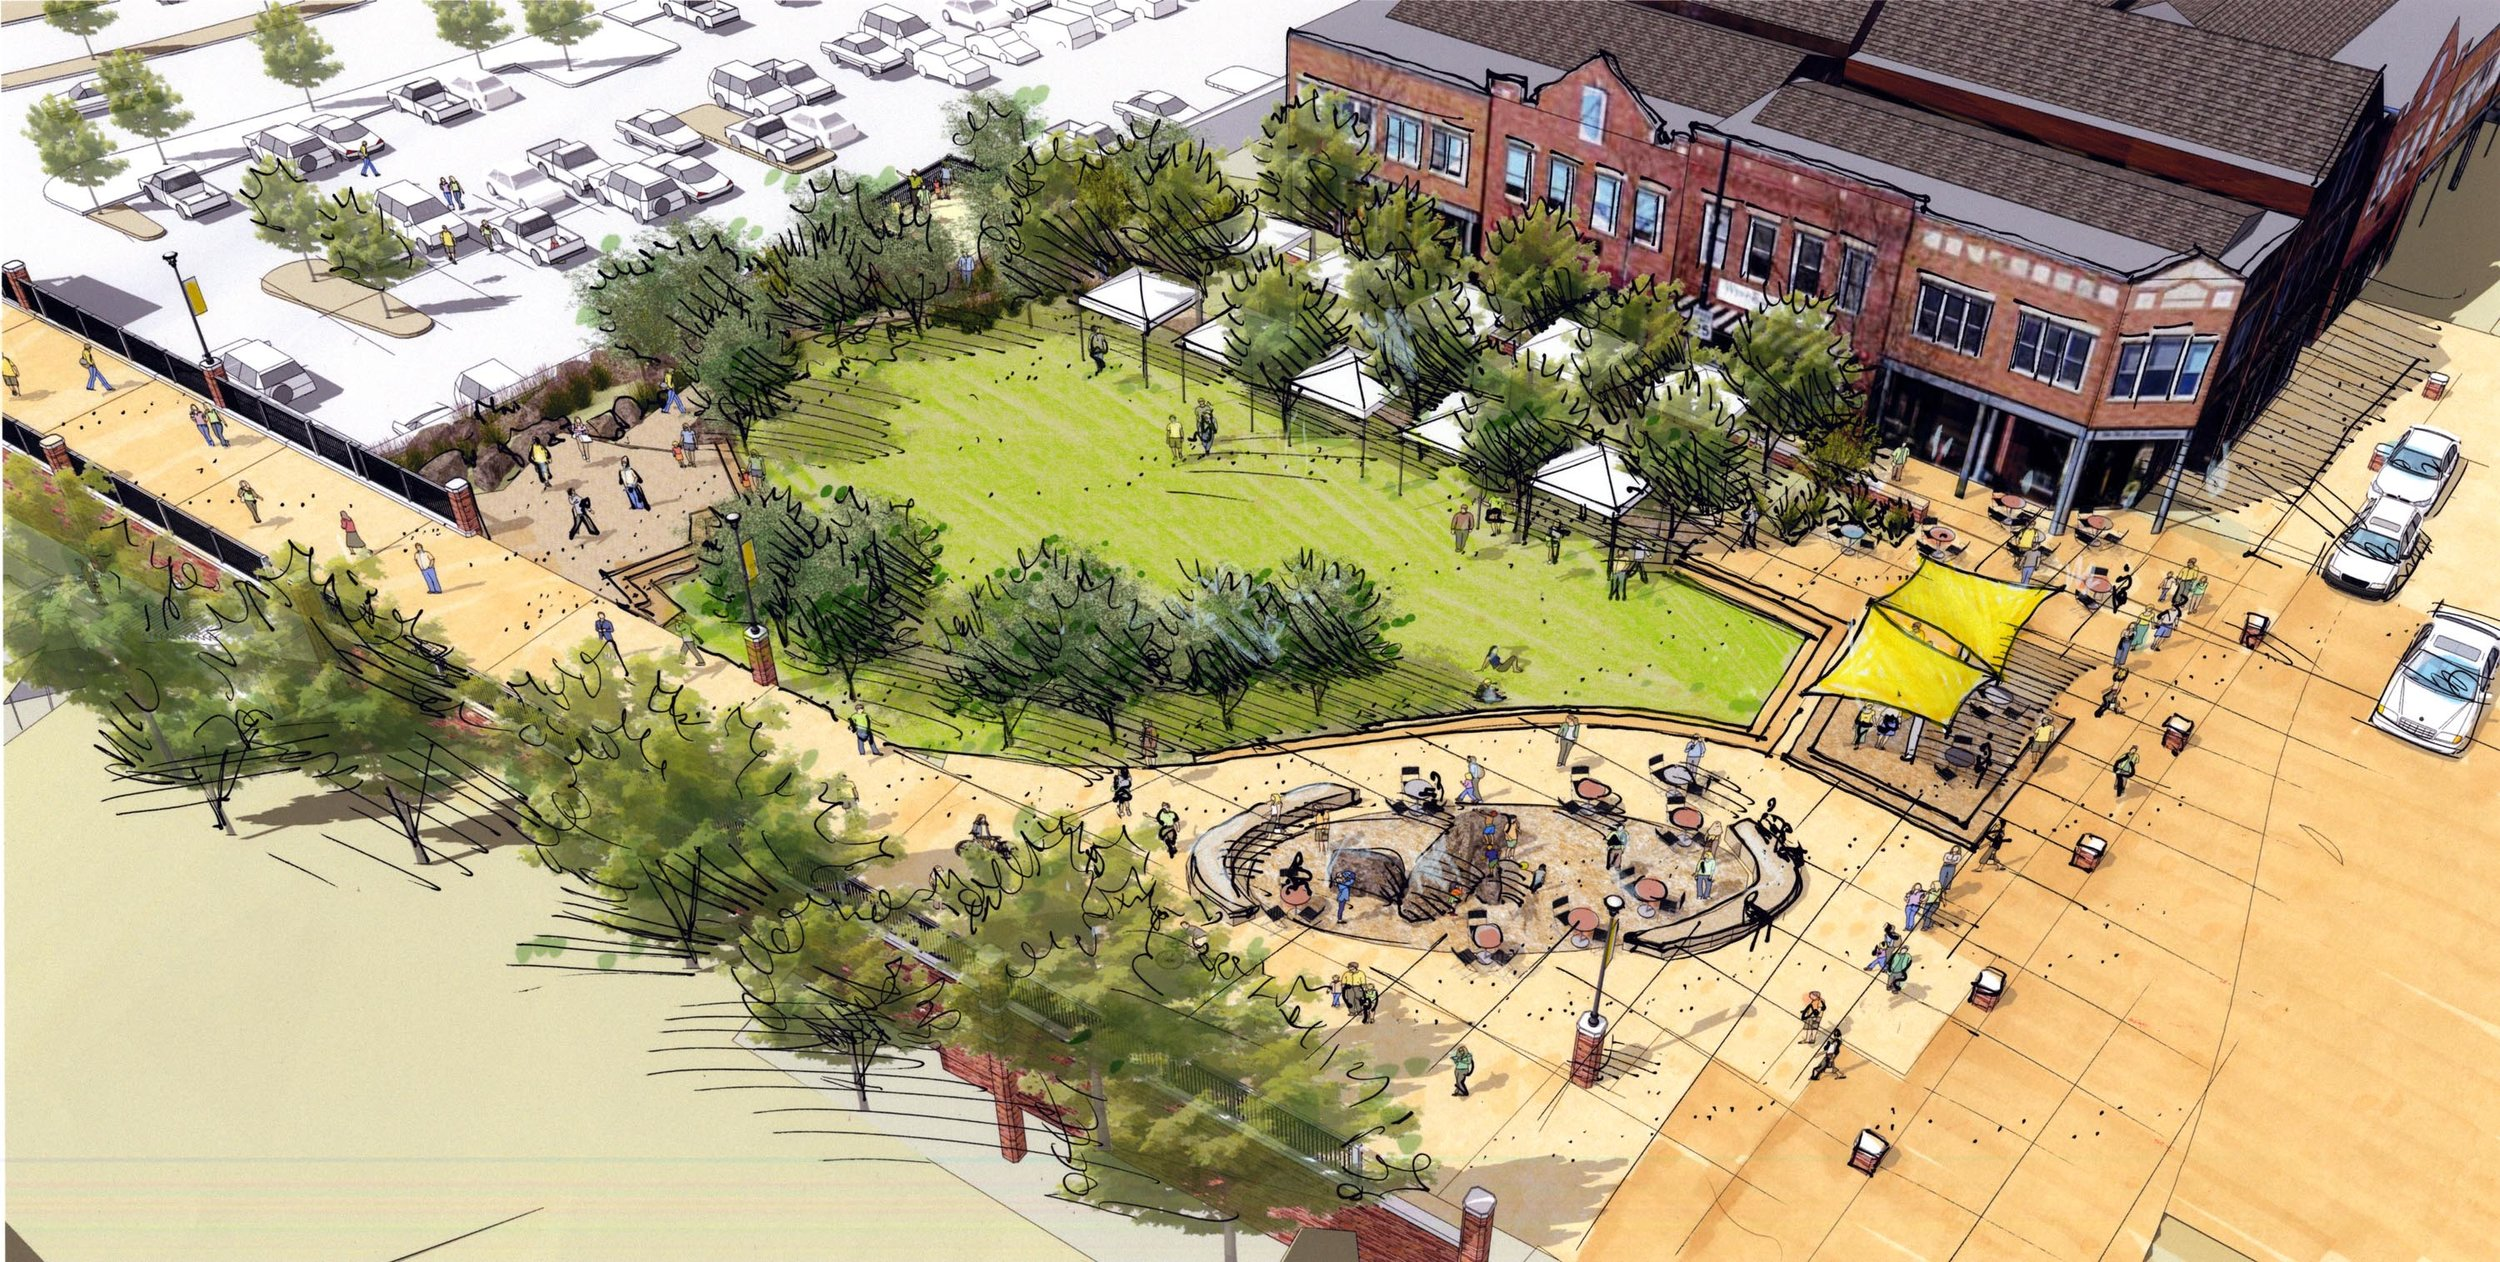 <f>Services</f><f>Landscape Architecture</f><f>Markets</f><f>Community</f><t>6th St. Park</t><m>Glenwood Springs, CO</m>